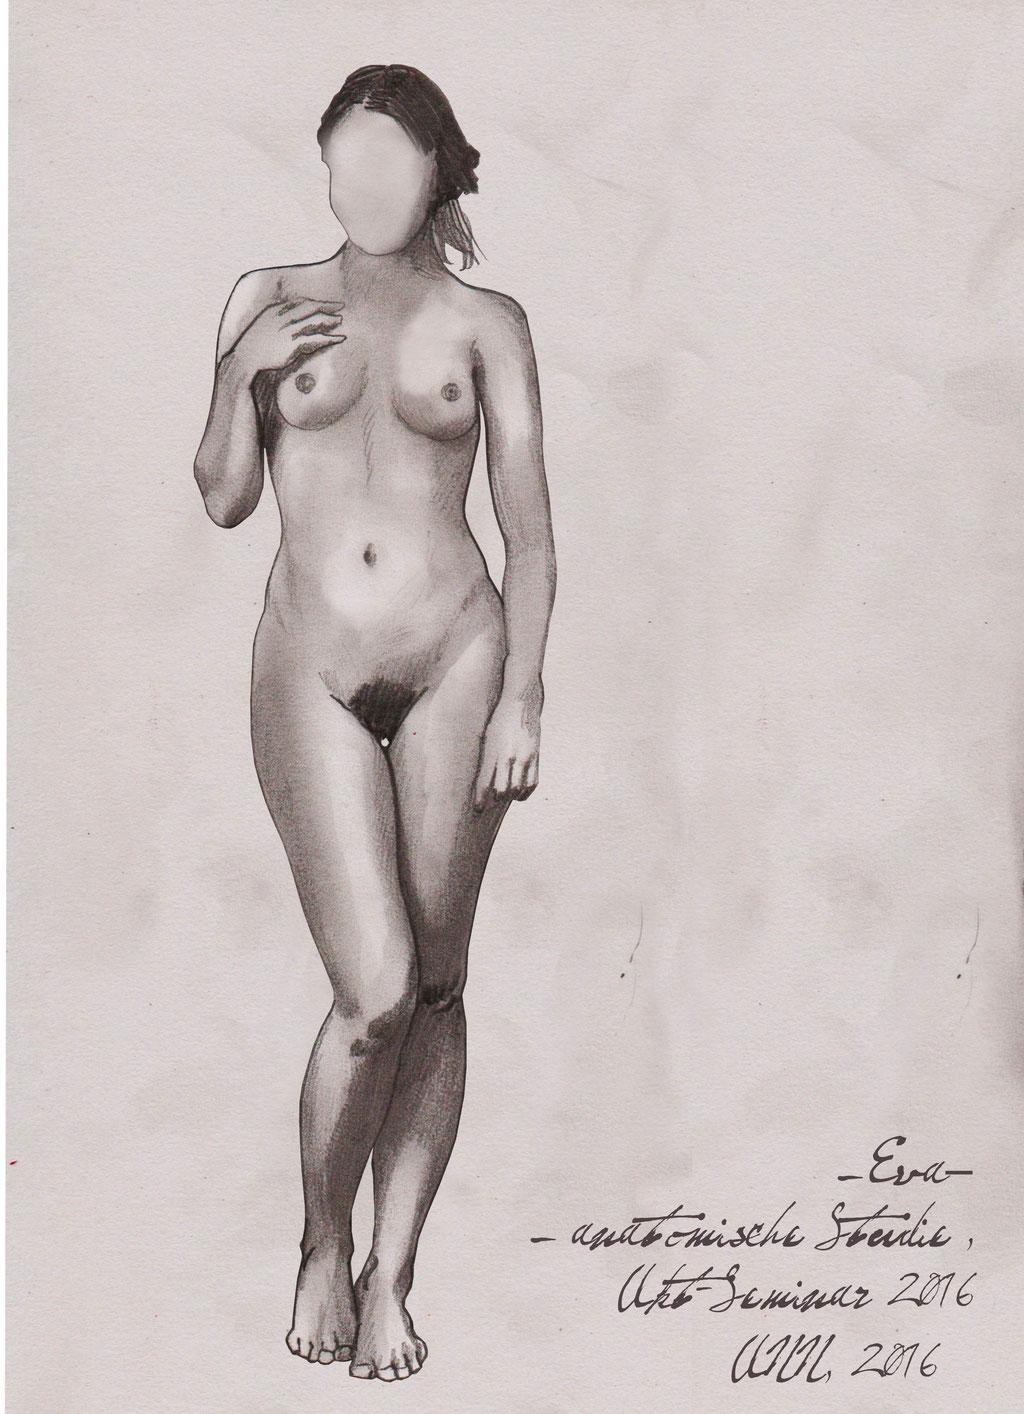 E., 2002